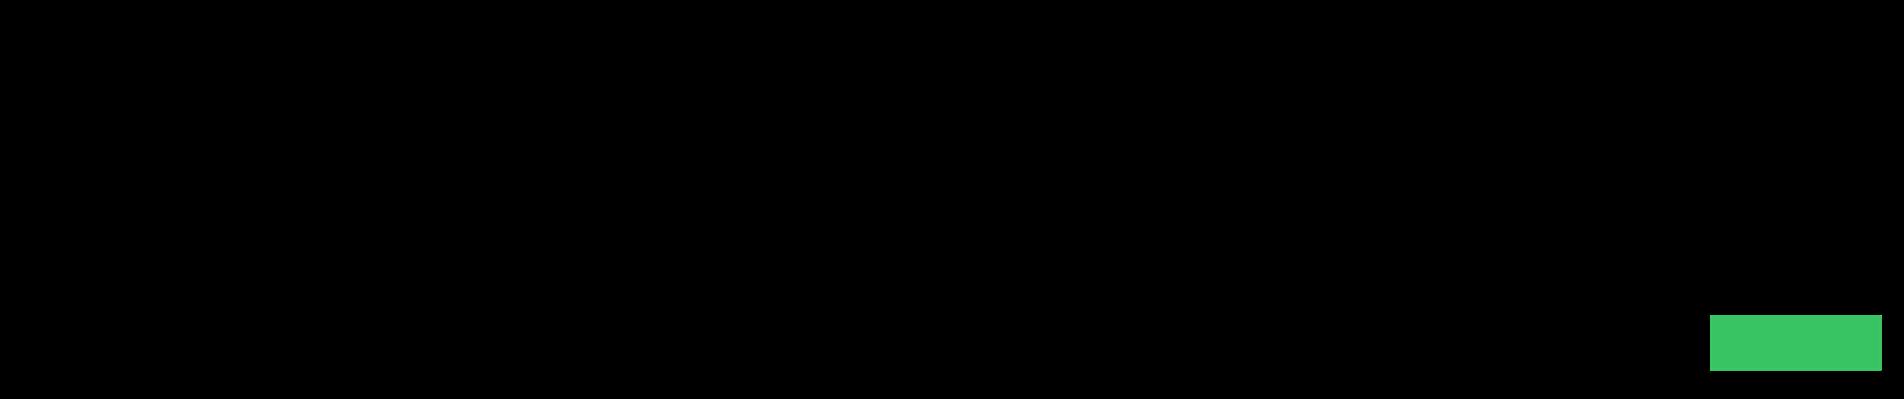 Techstars logo primary black